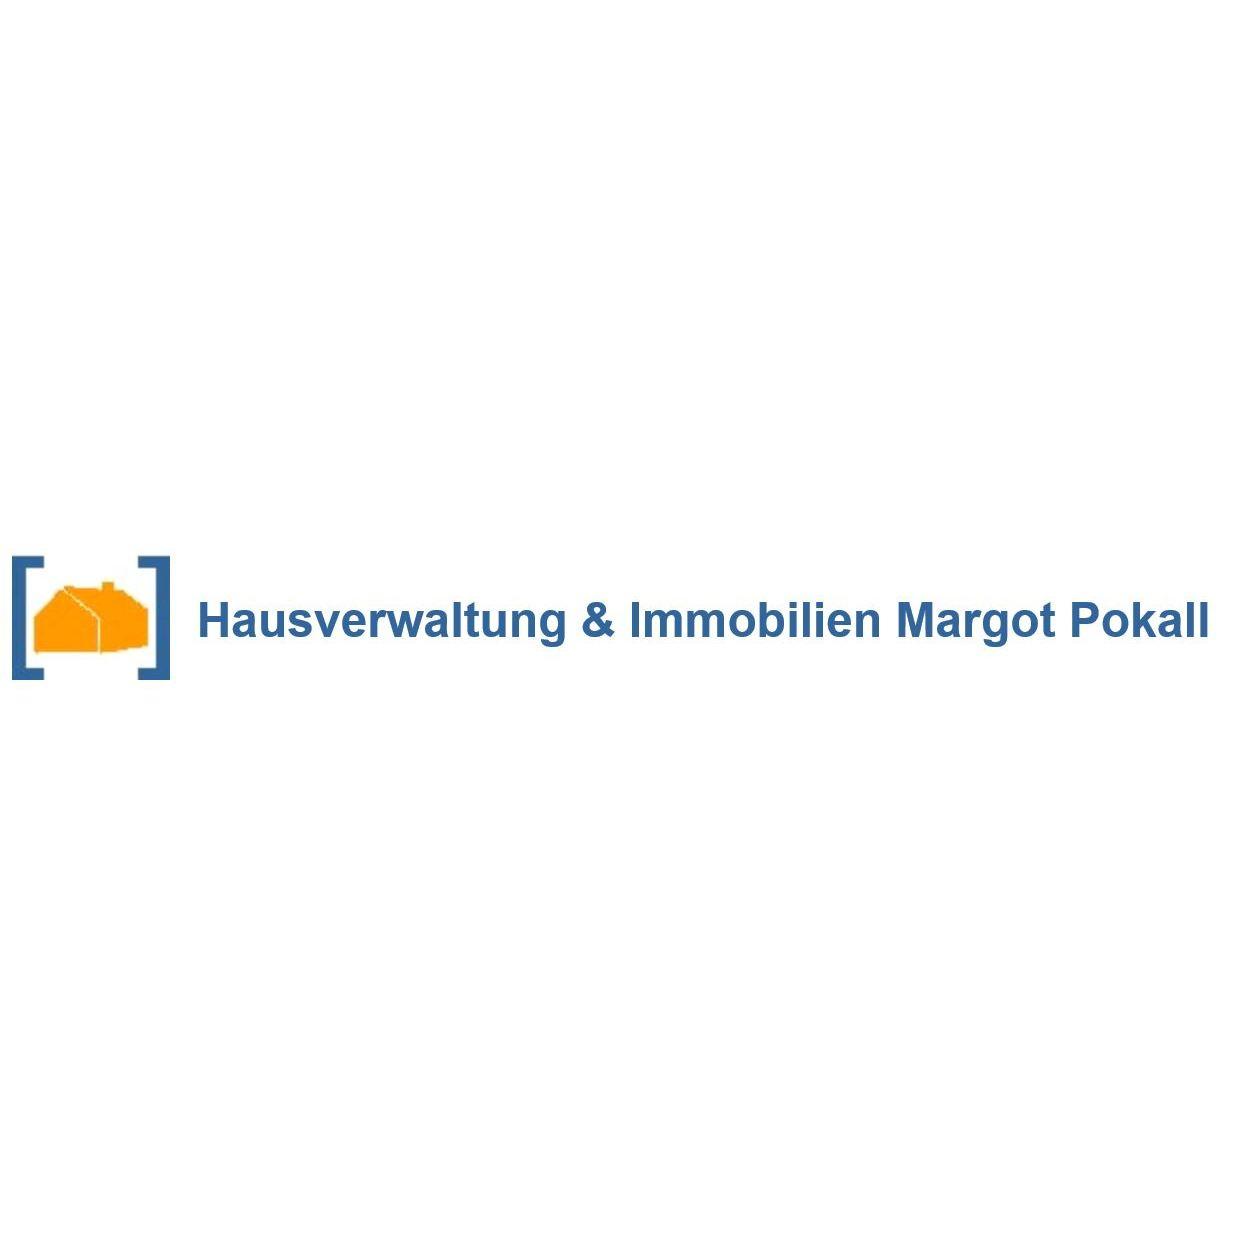 Hausverwaltung & Immobilien Margot Pokall